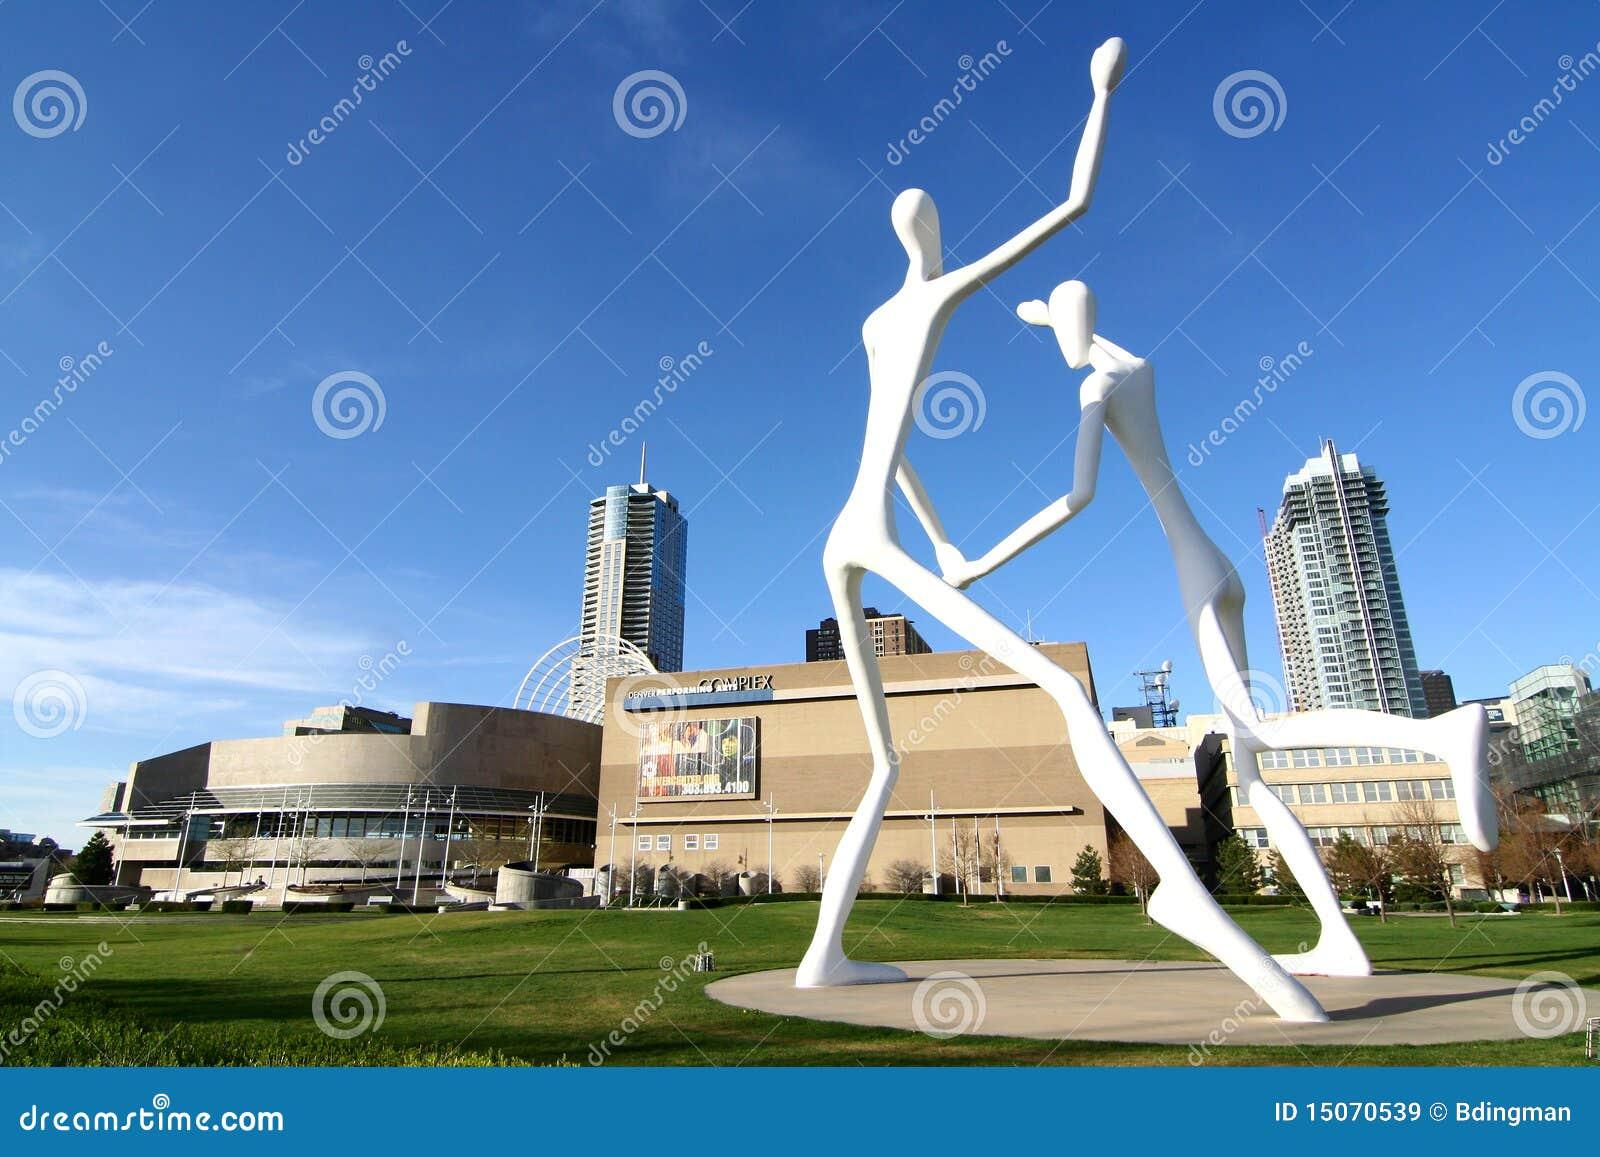 Sculpture Park - Denver